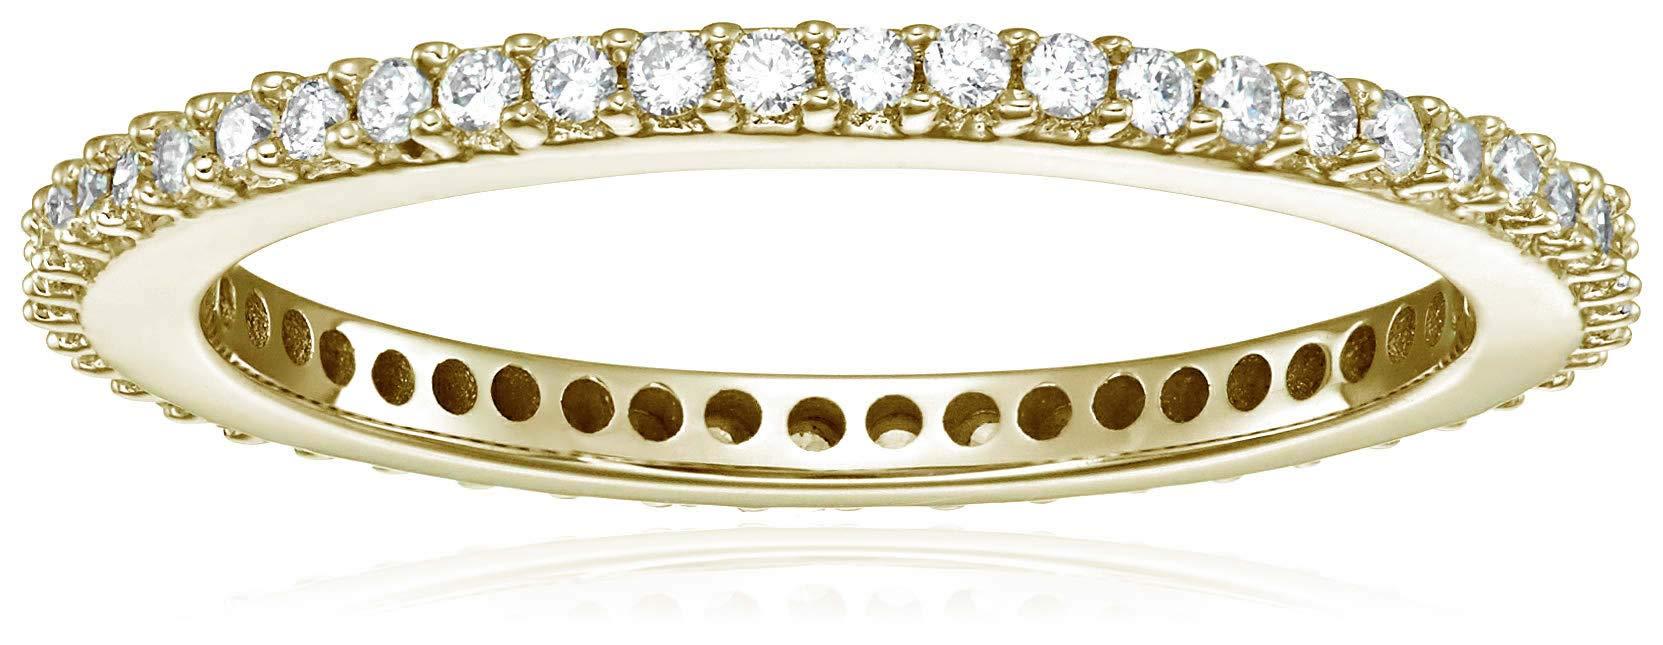 Vir Jewels 1/2 cttw Diamond Eternity Ring 14K Yellow Gold Wedding Band Size 6